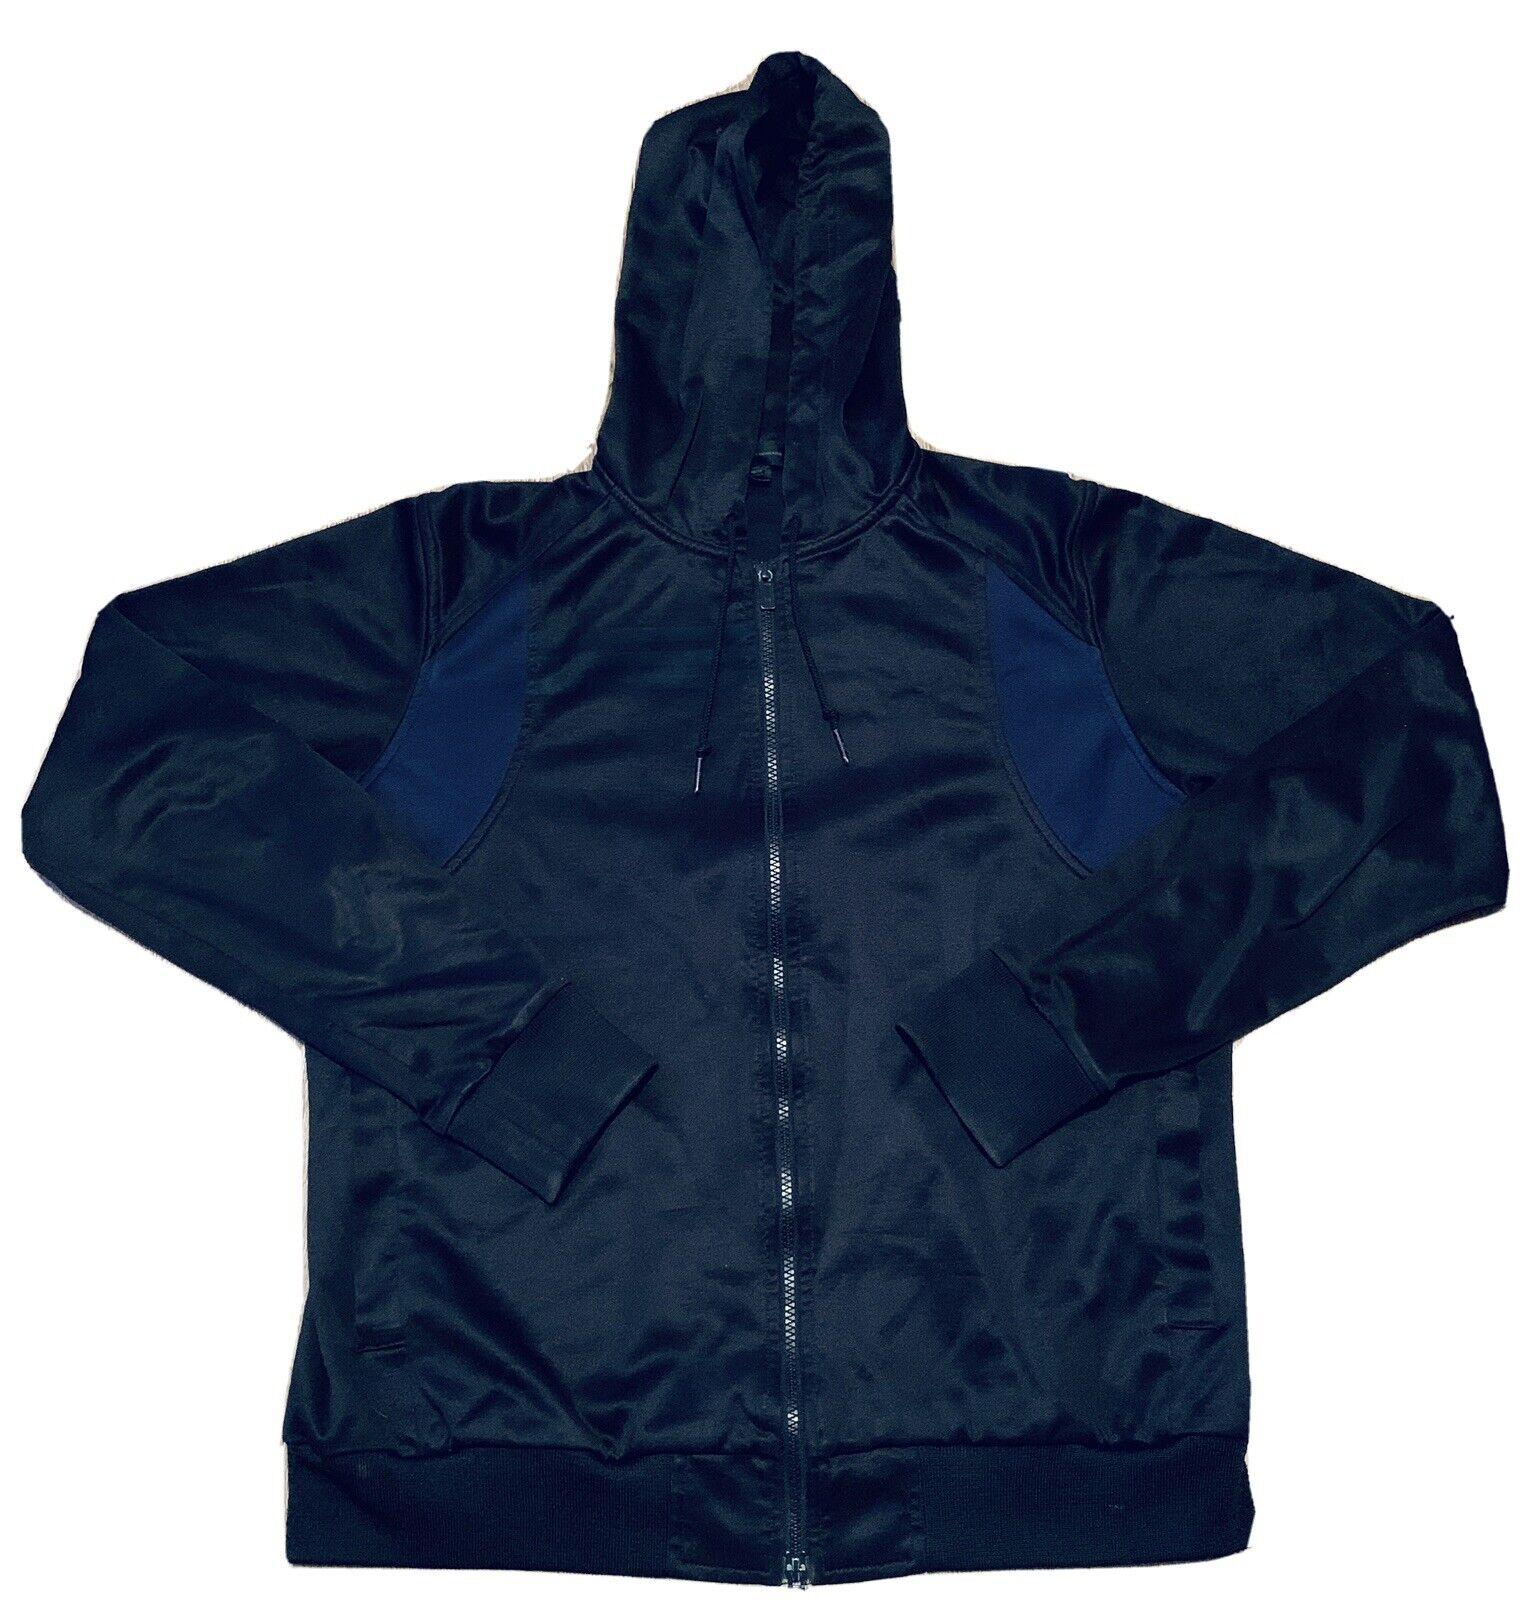 Hurley Phantom 3 Layer Jacket Black